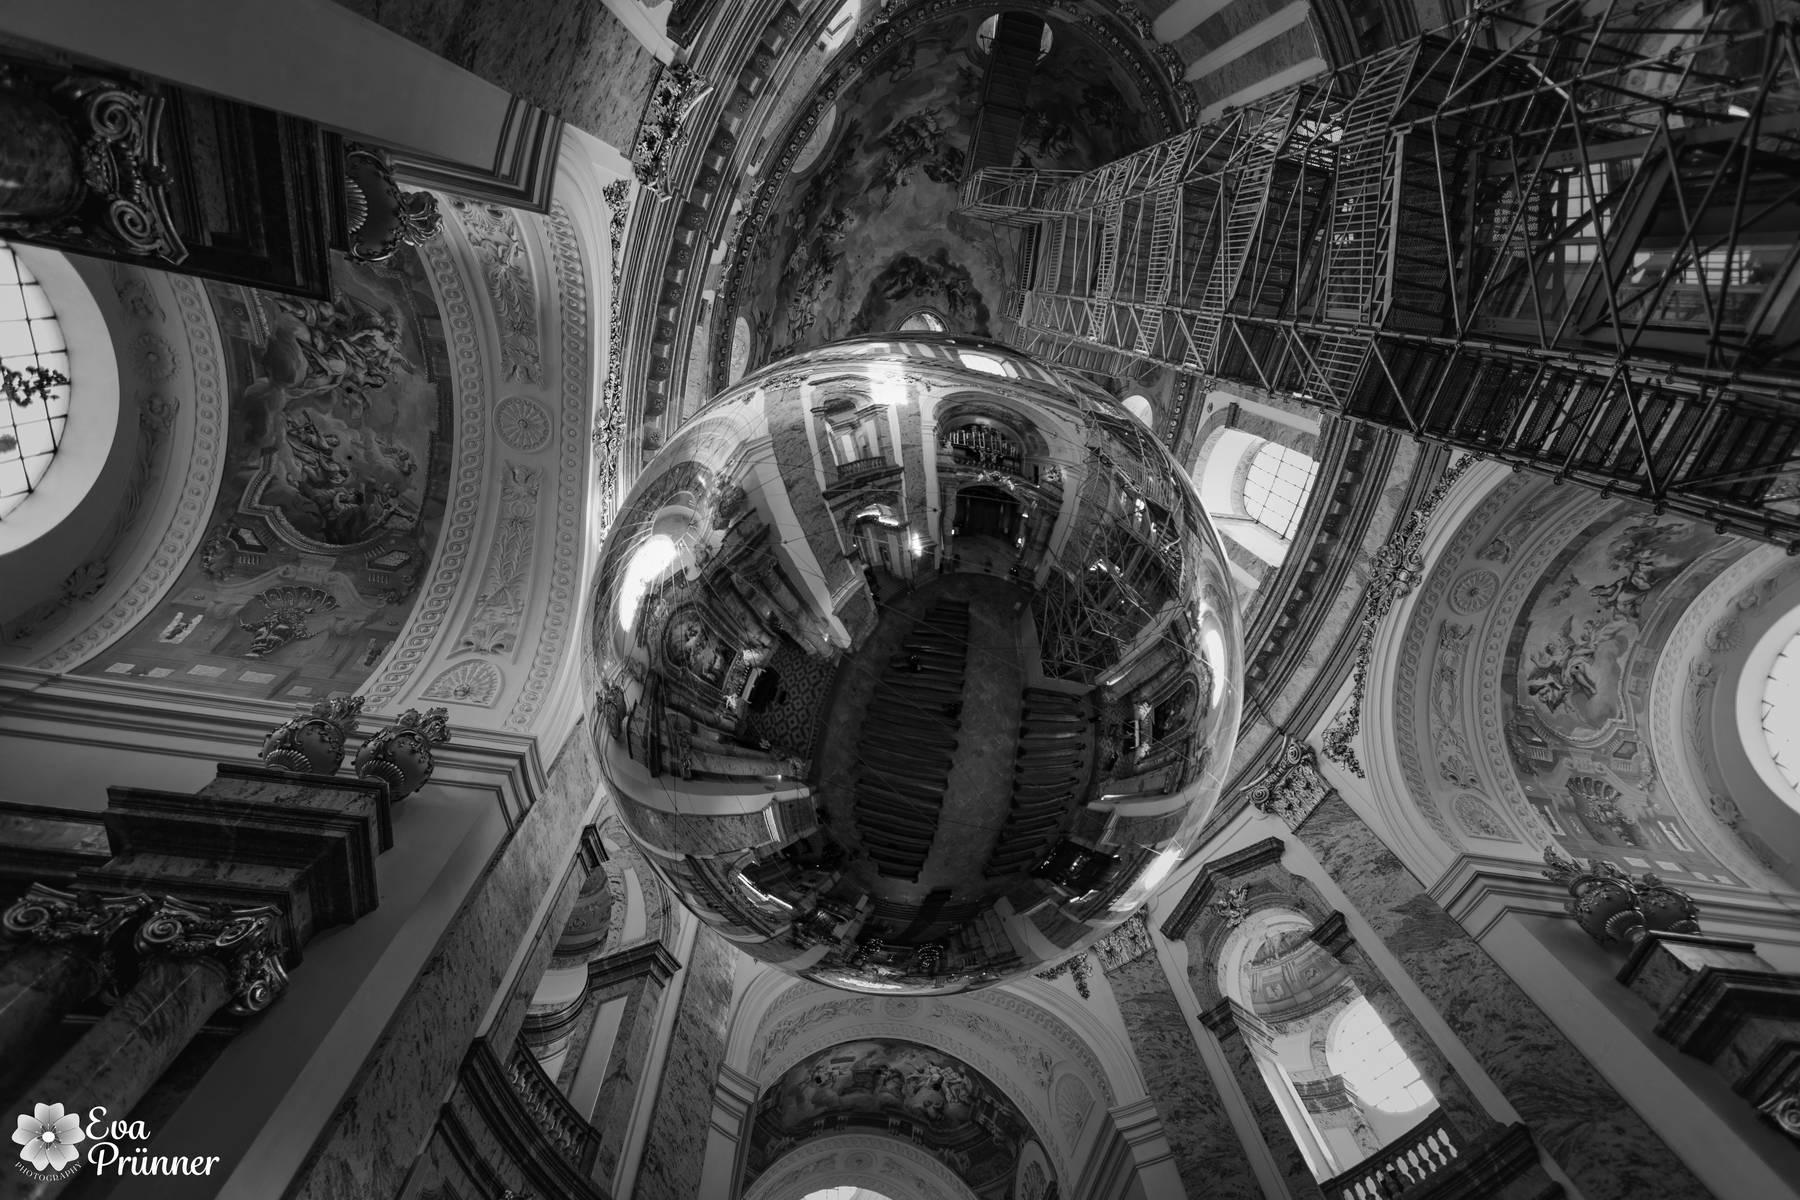 Schwarz Weiß, Monochrom, Kugel, Kirche, Karlskirche, Wien